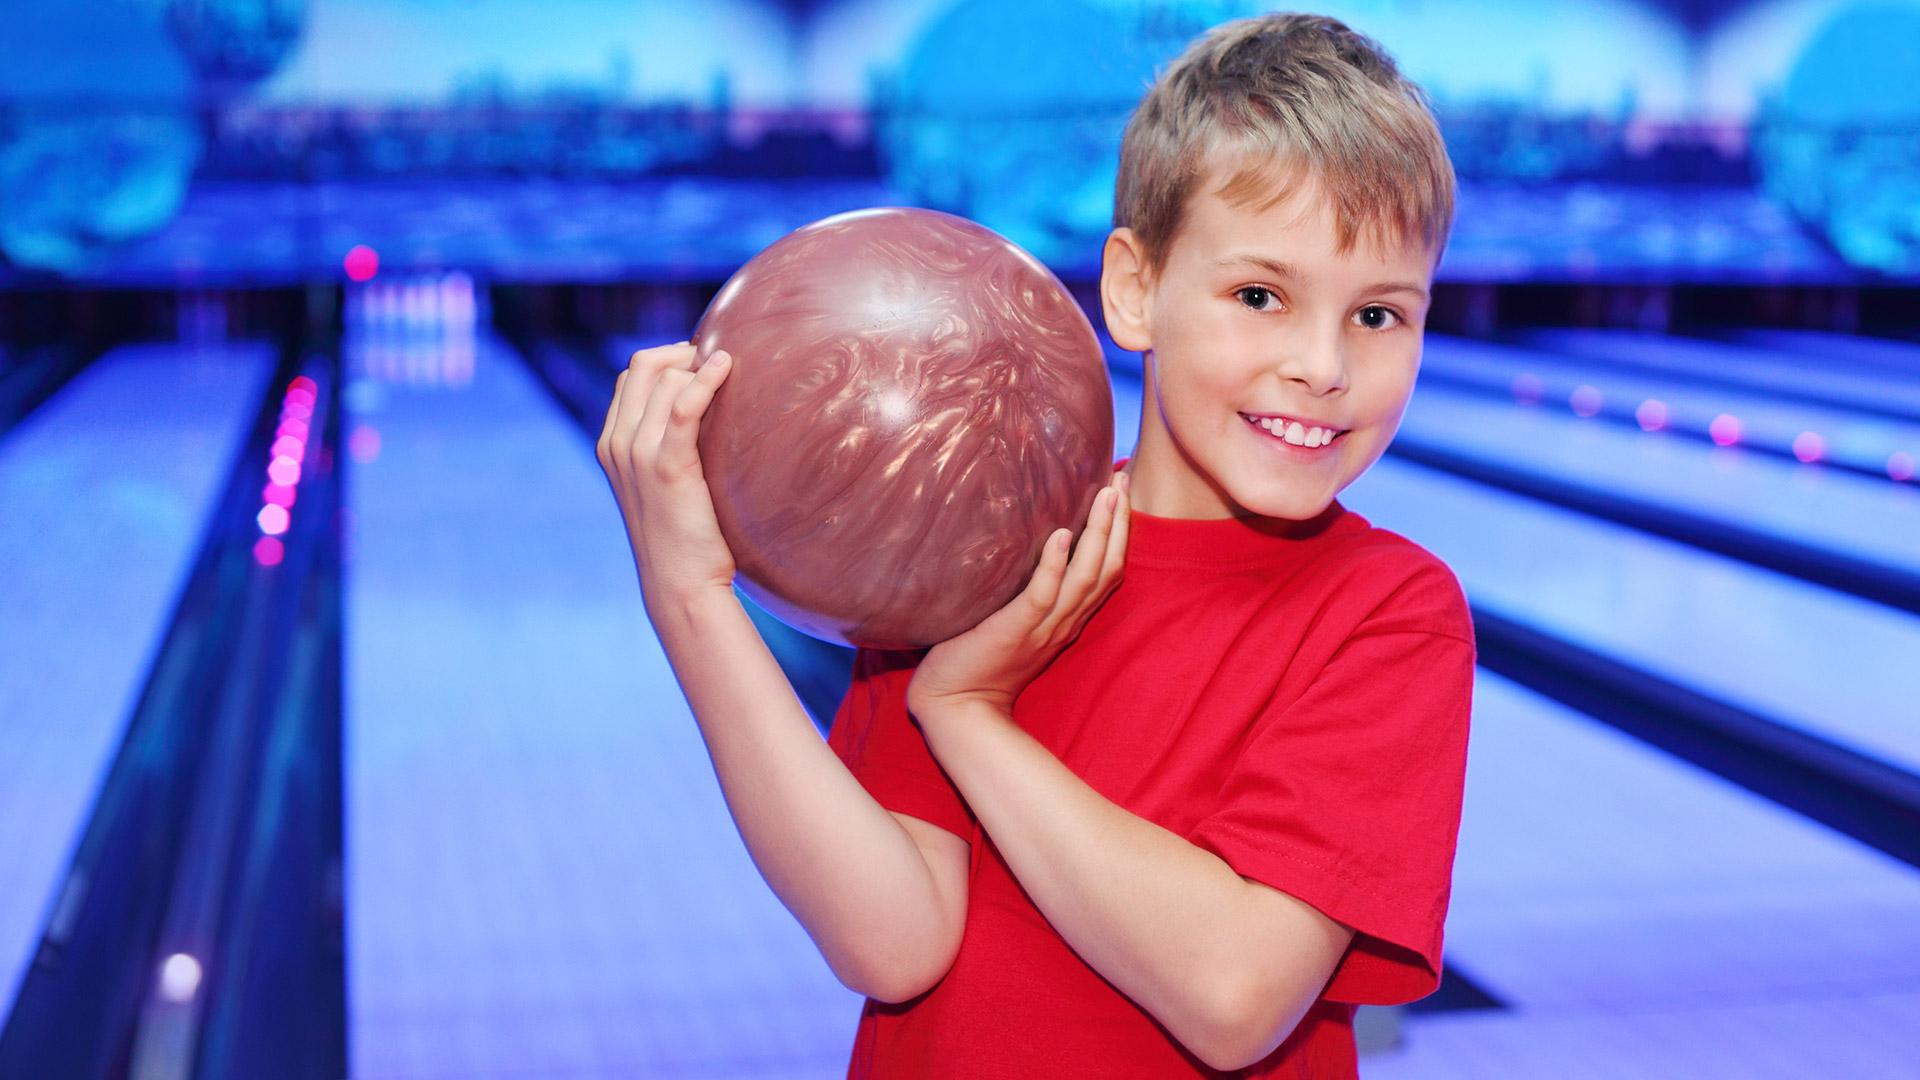 Bowling arrangement